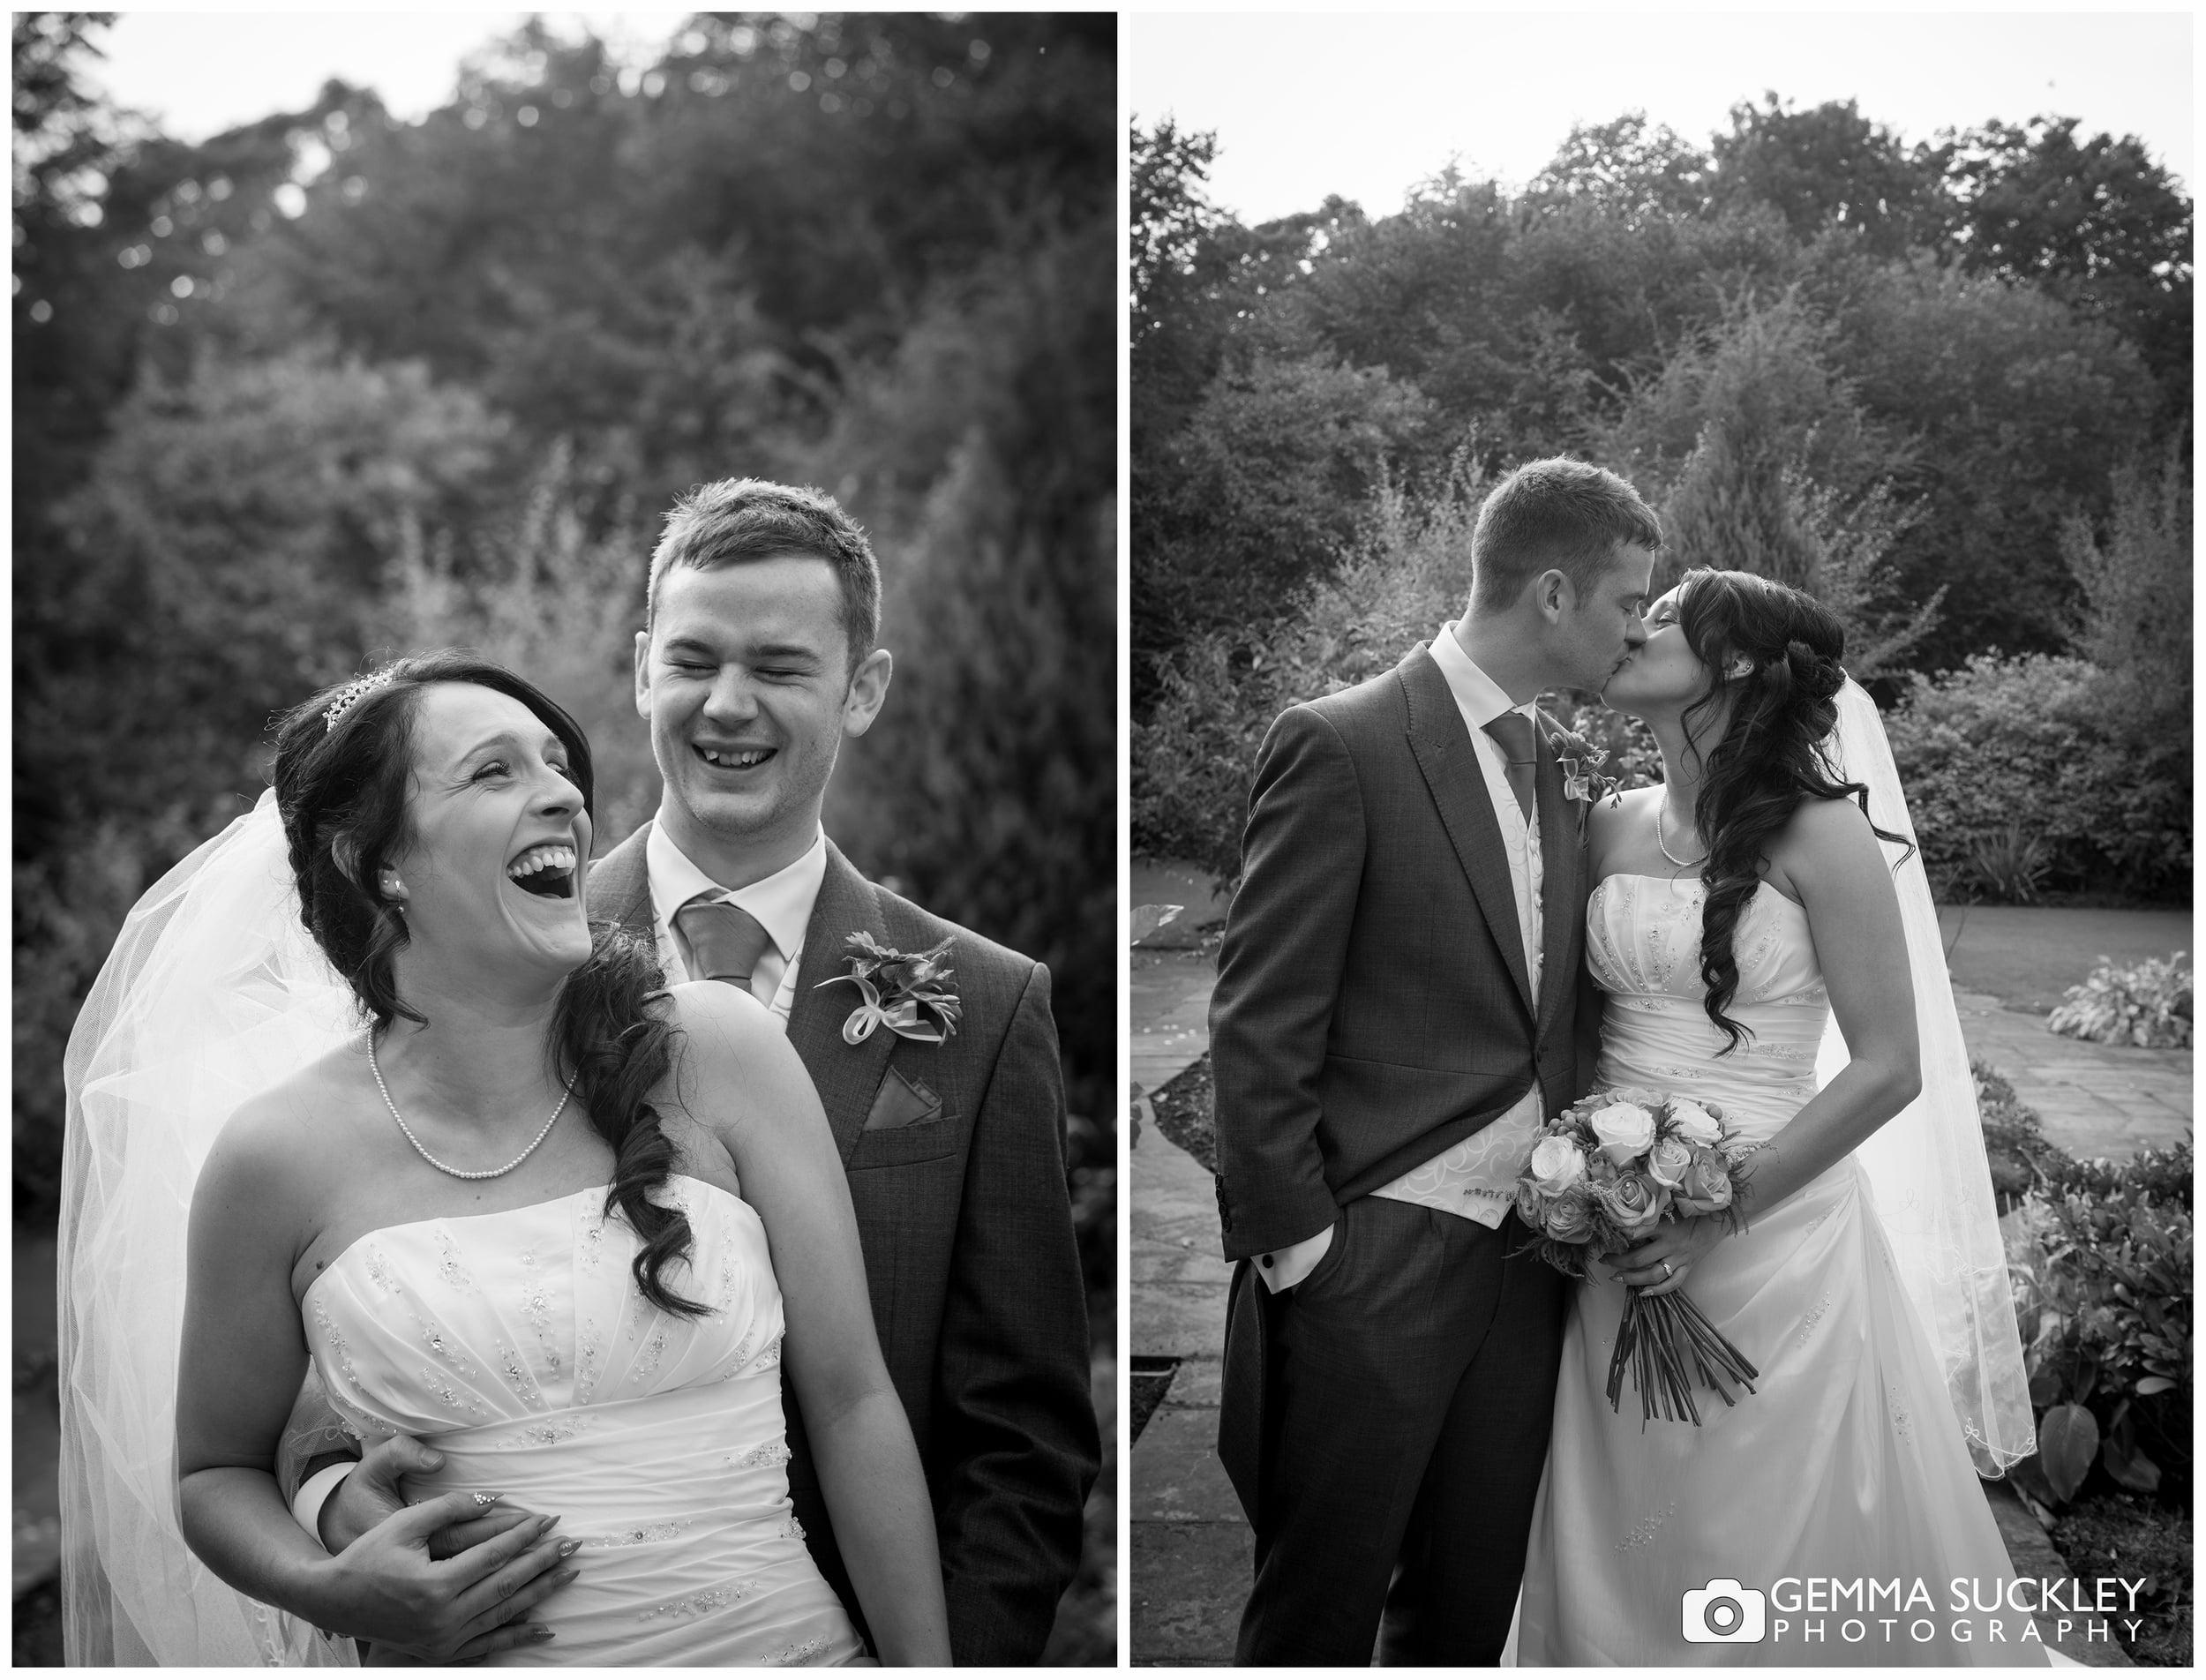 wedding-portrait-baildon.jpg